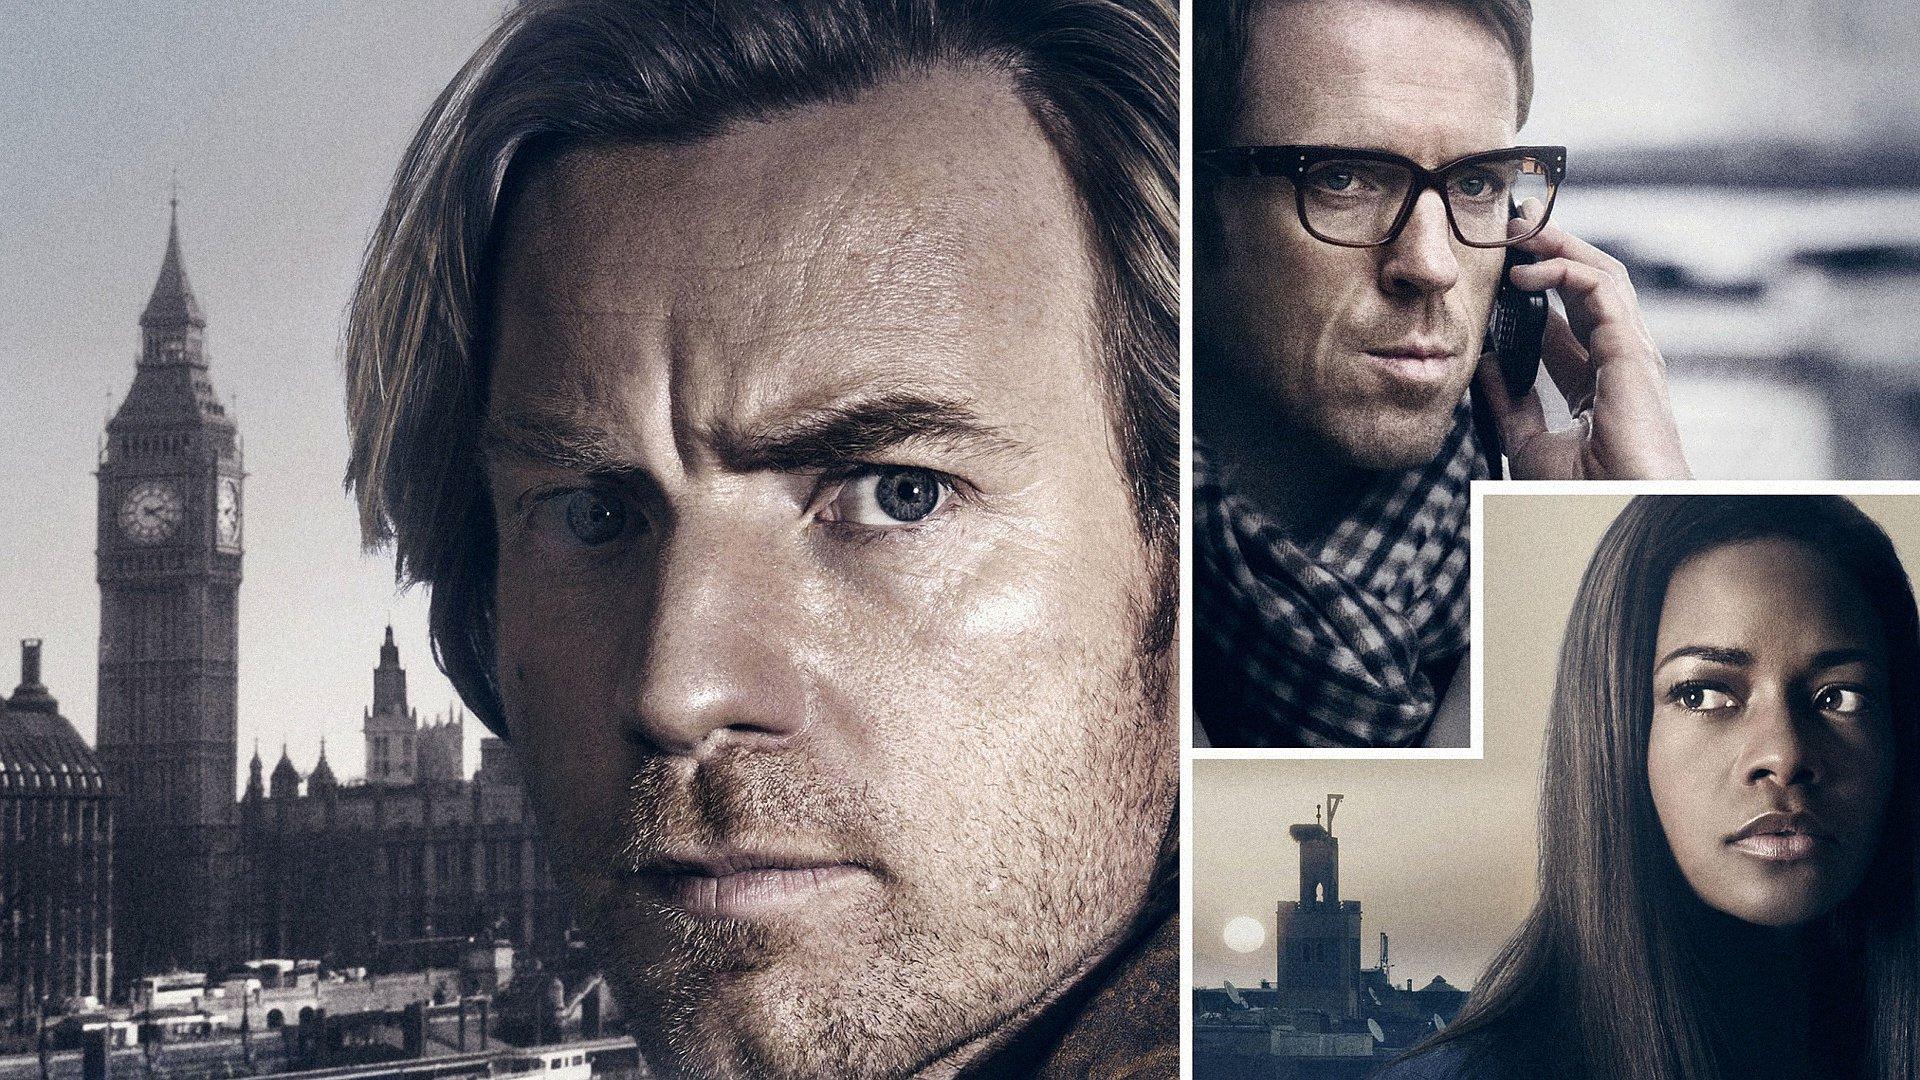 Wallpaper Our Kind of Traitor, 2016 movie, Ewan McGregor